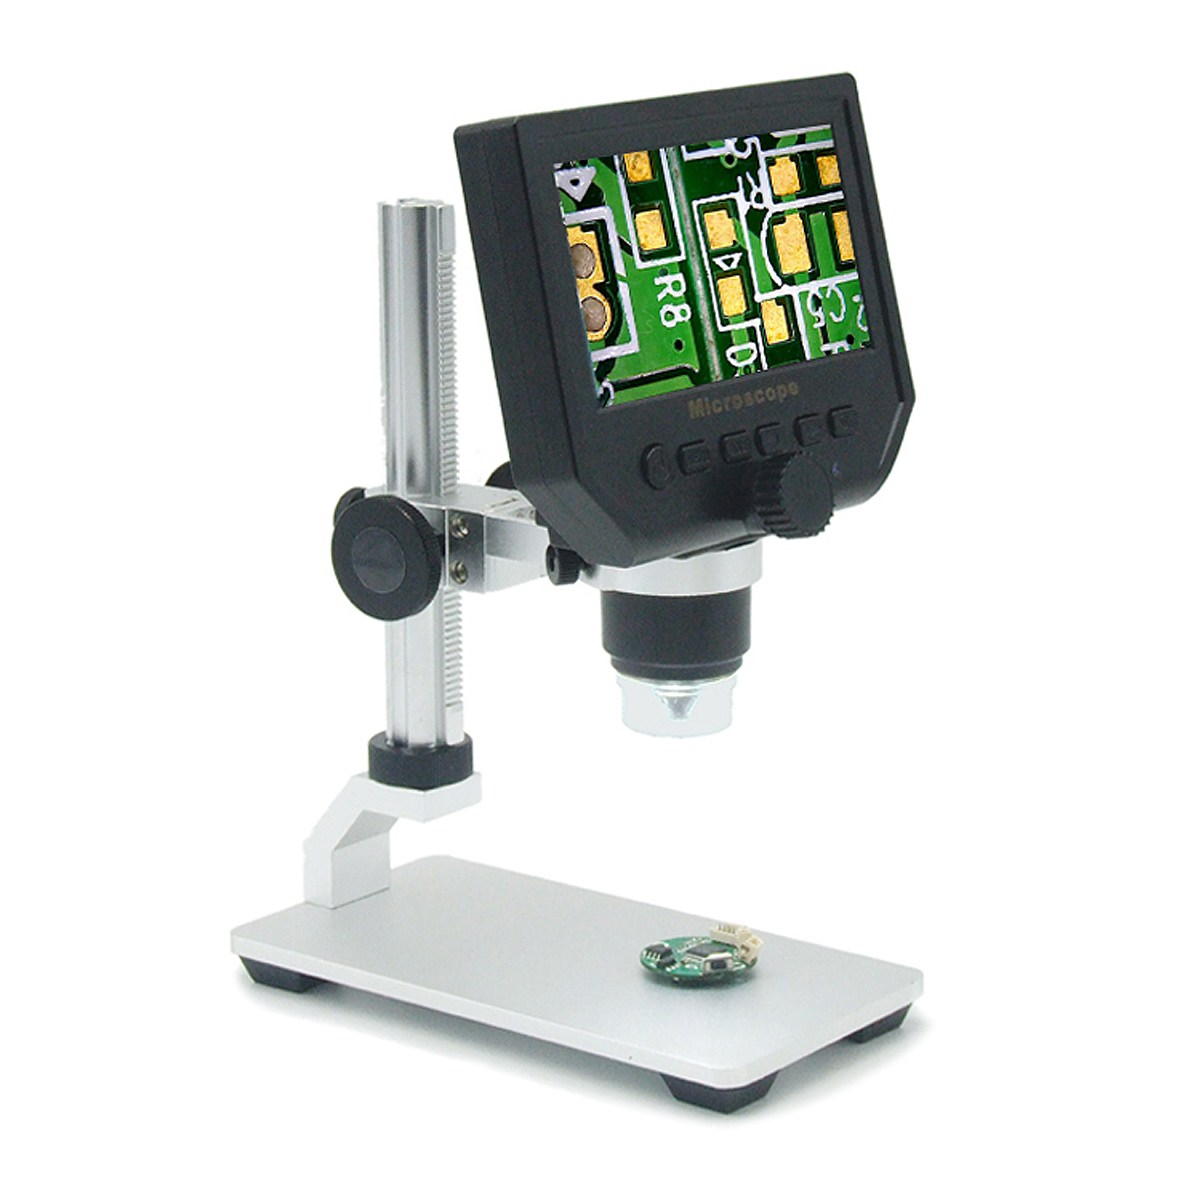 1-600x USB цифровой электронный микроскоп 4.3 дюймов HD ЖК-дисплей дисплей электронный микроскоп для печатной плате ремонт